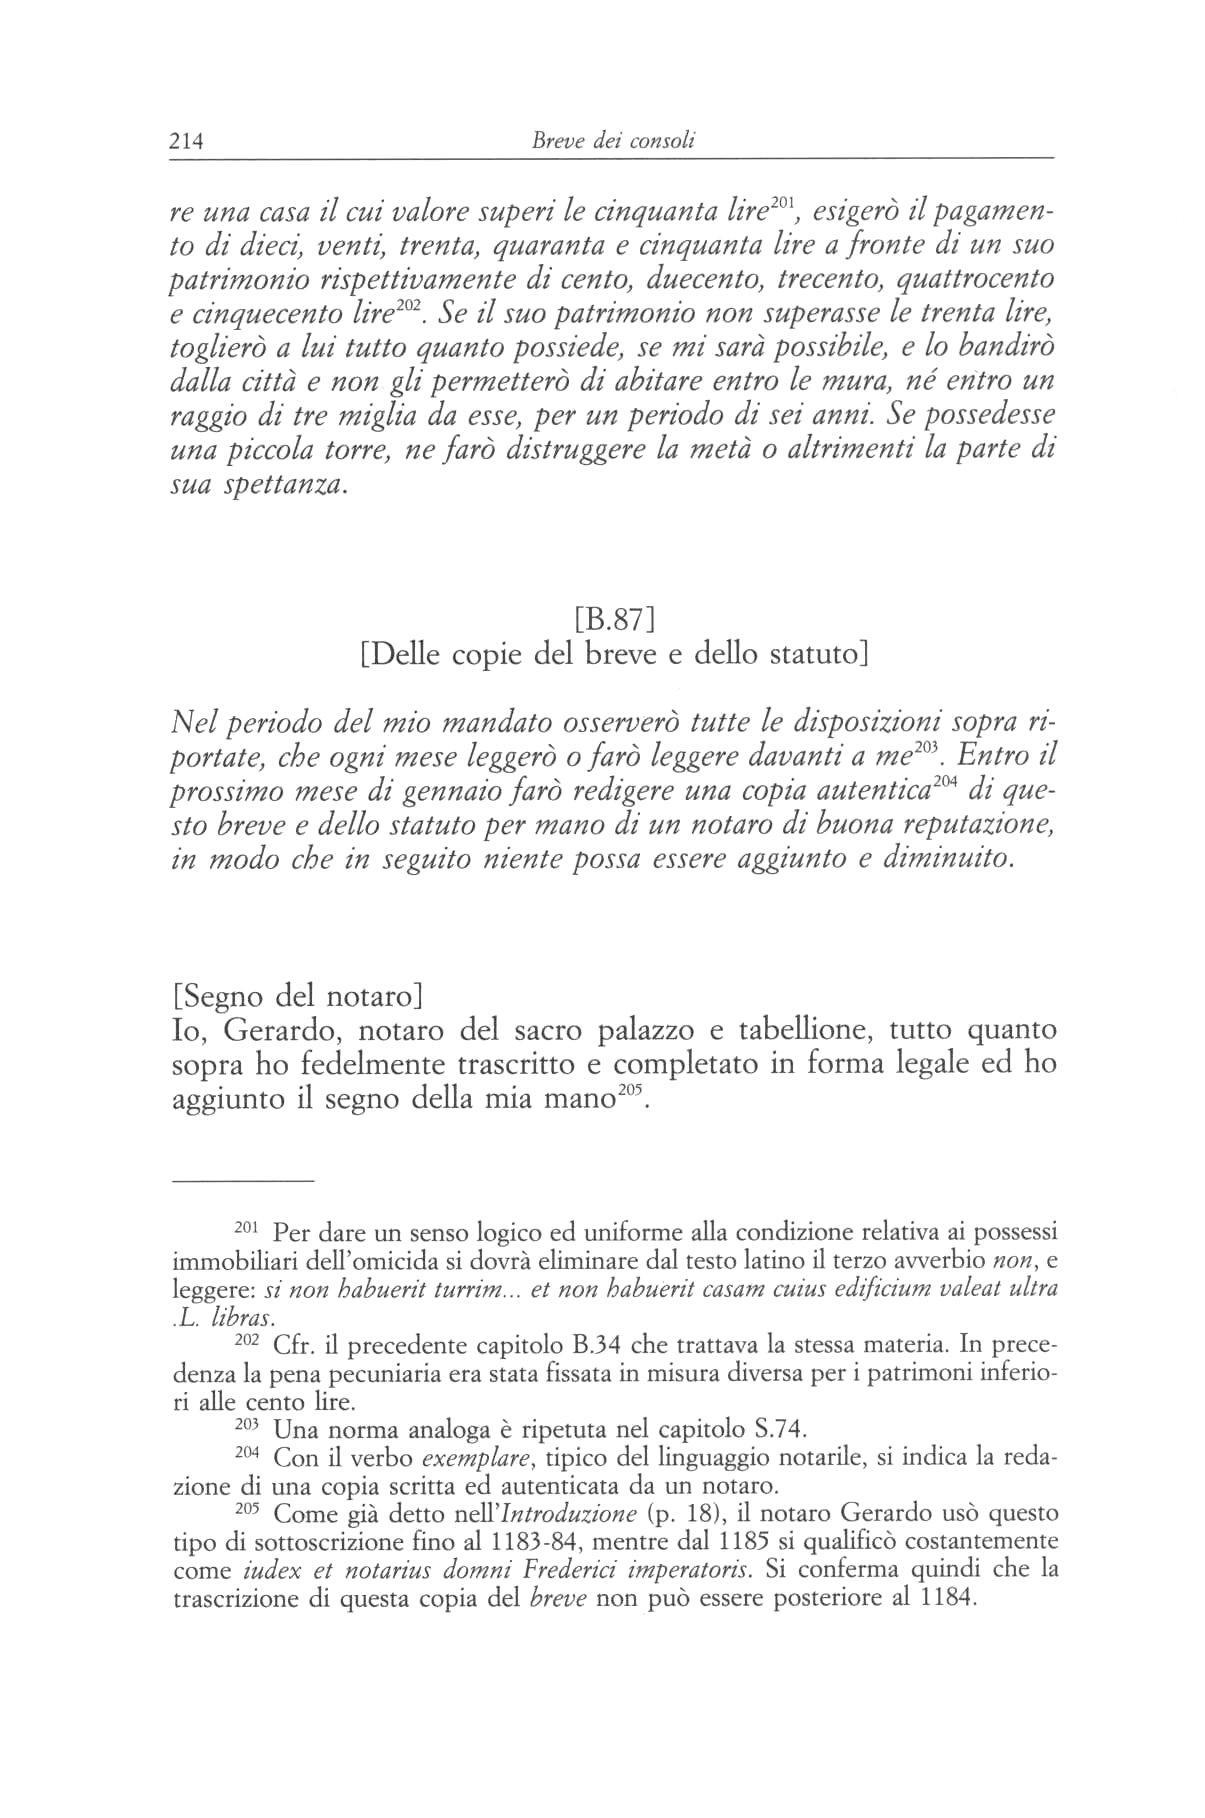 statuti pistoiesi del sec.XII 0214.jpg